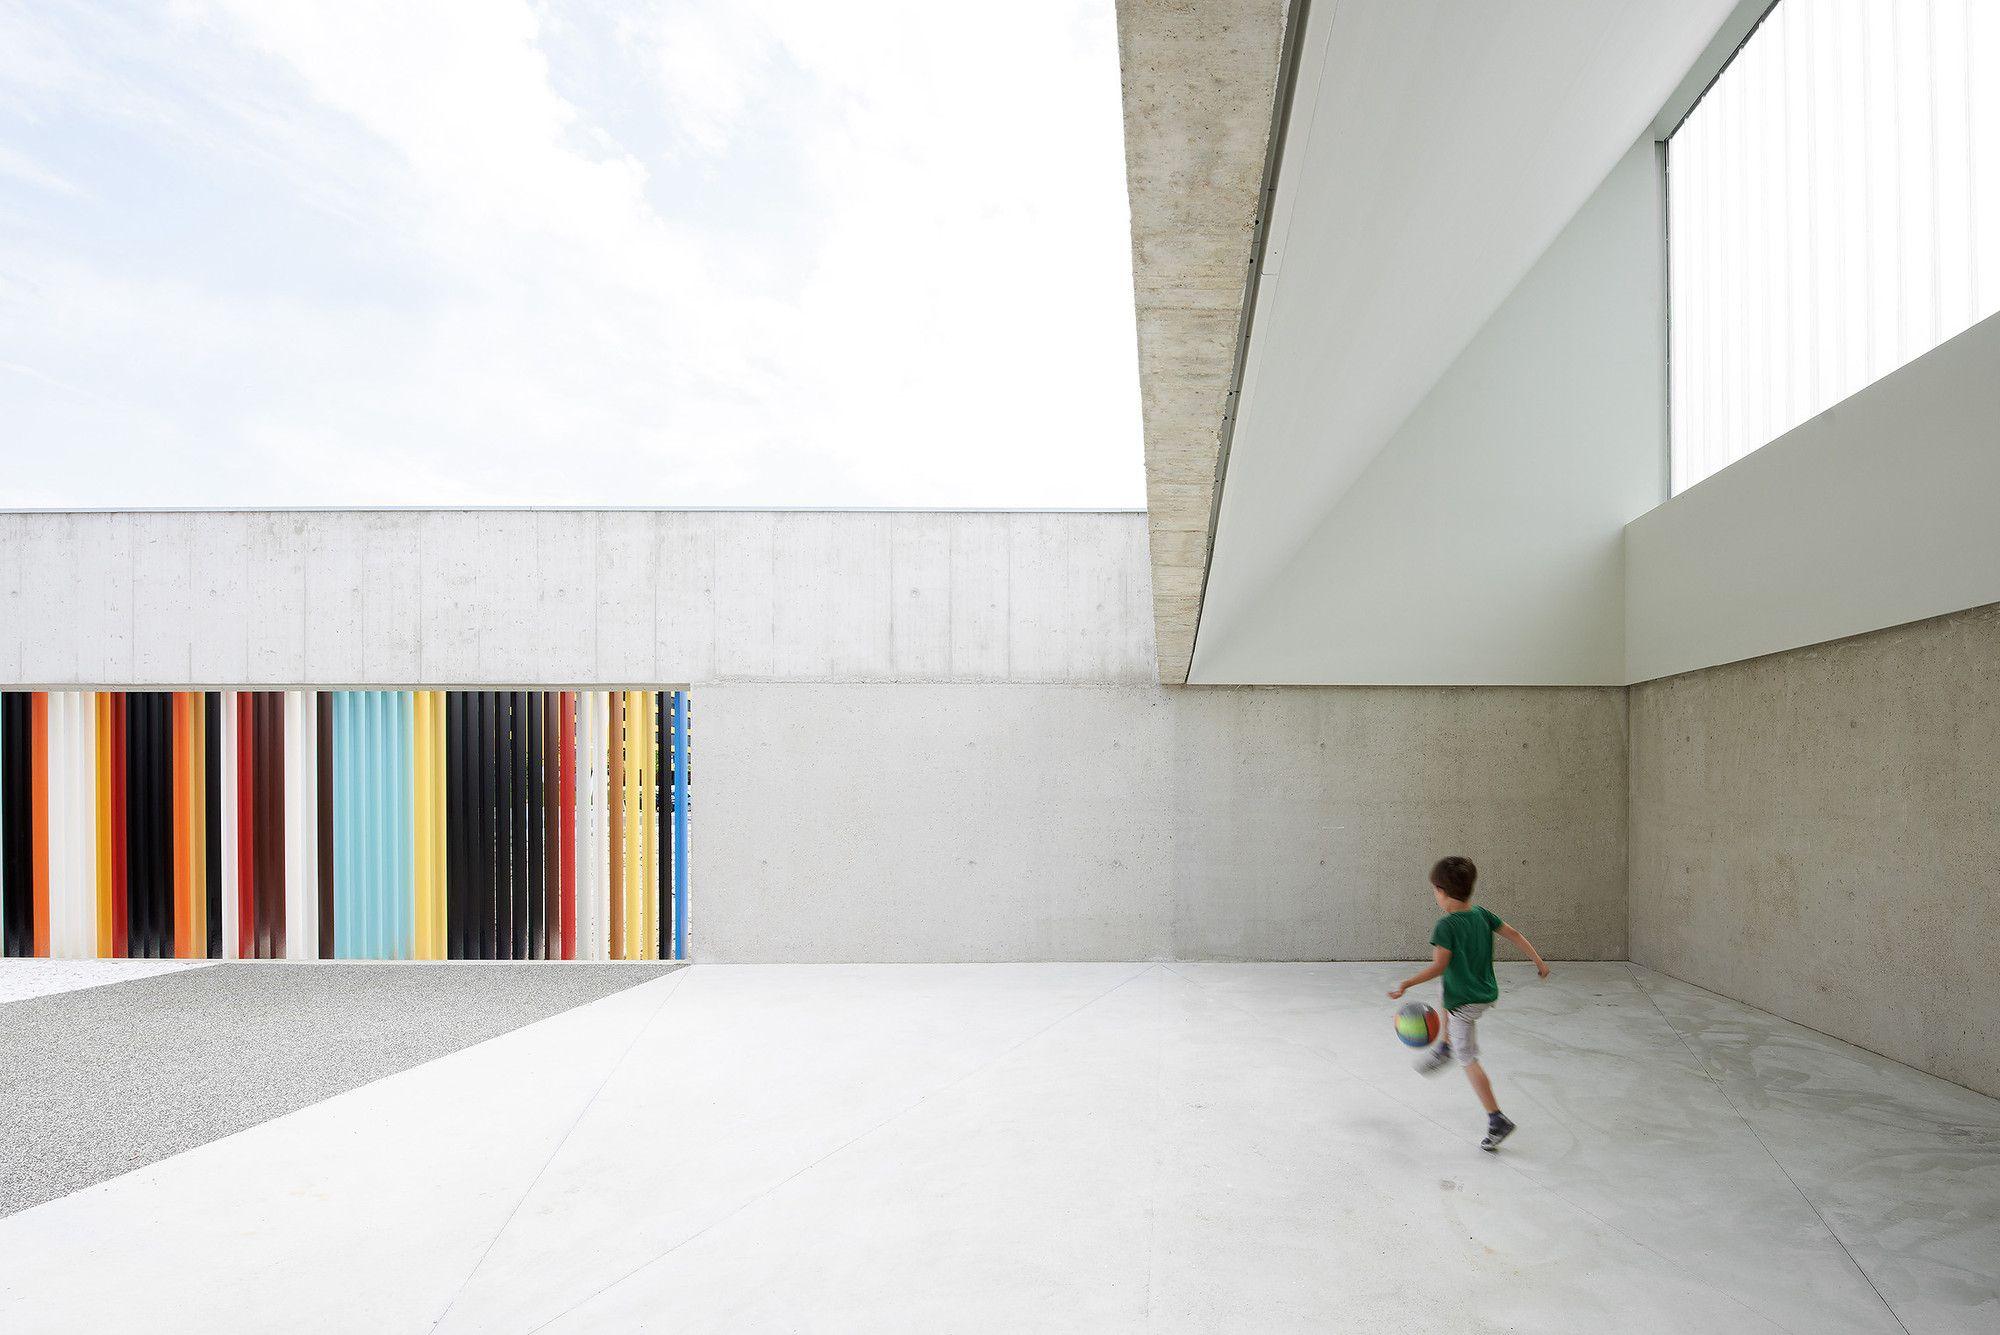 Galeria de Escola Infantil Municipal De Berriozar / Javier Larraz + Iñigo Beguiristain + Iñaki Bergera - 6